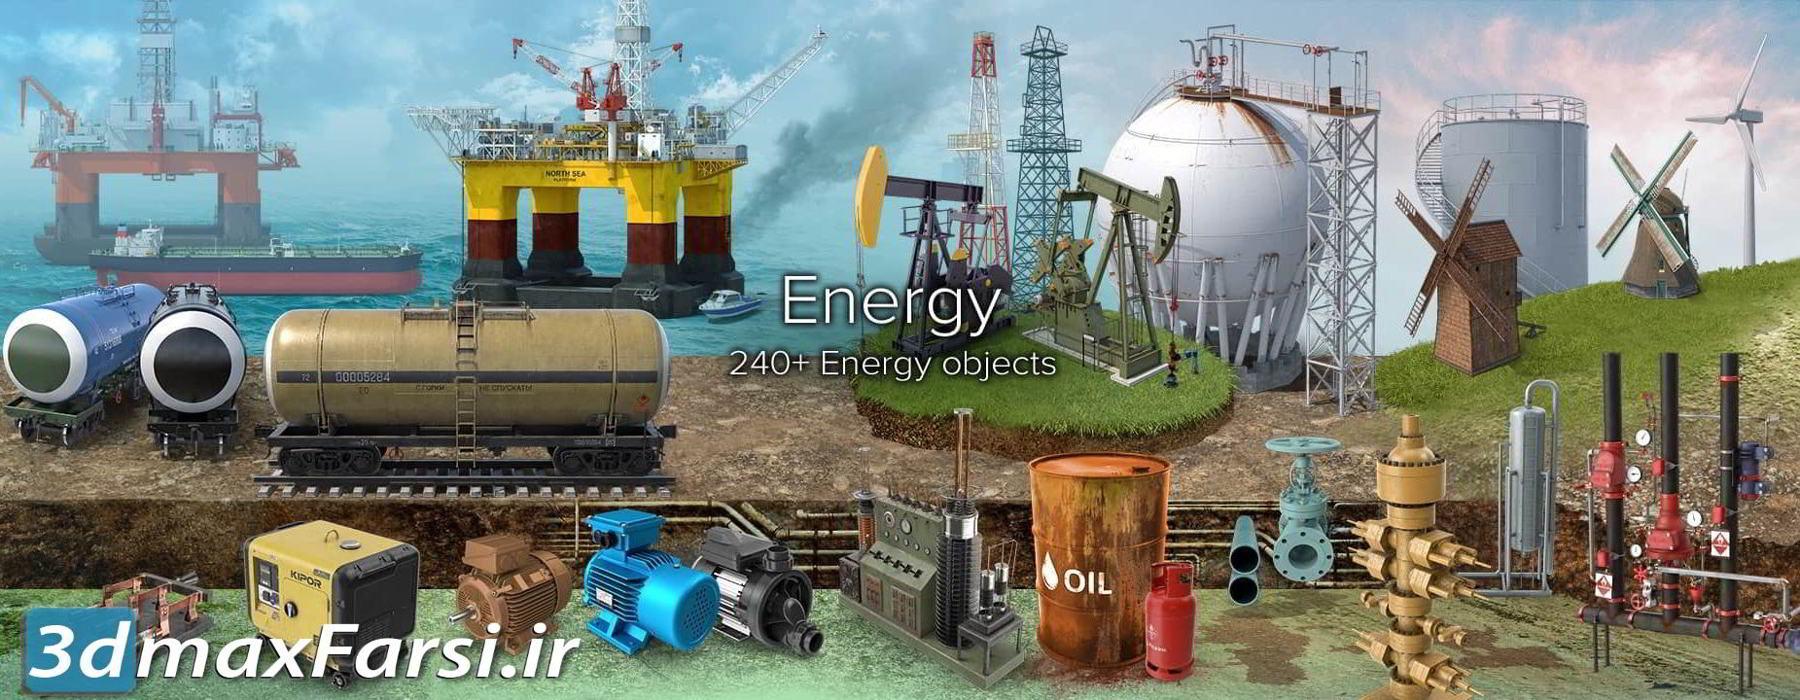 عکس گرافیکی انرژی گاز نفت برق PixelSquid Energy Collection